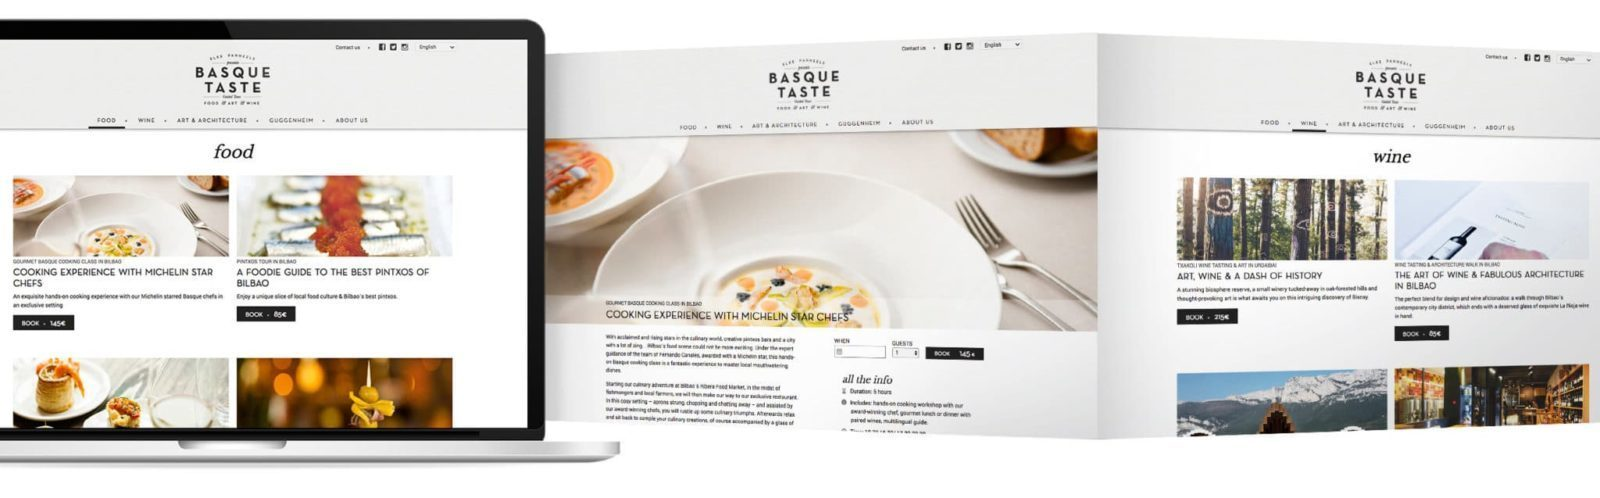 Sirope-Proyectos-Basque Taste-web